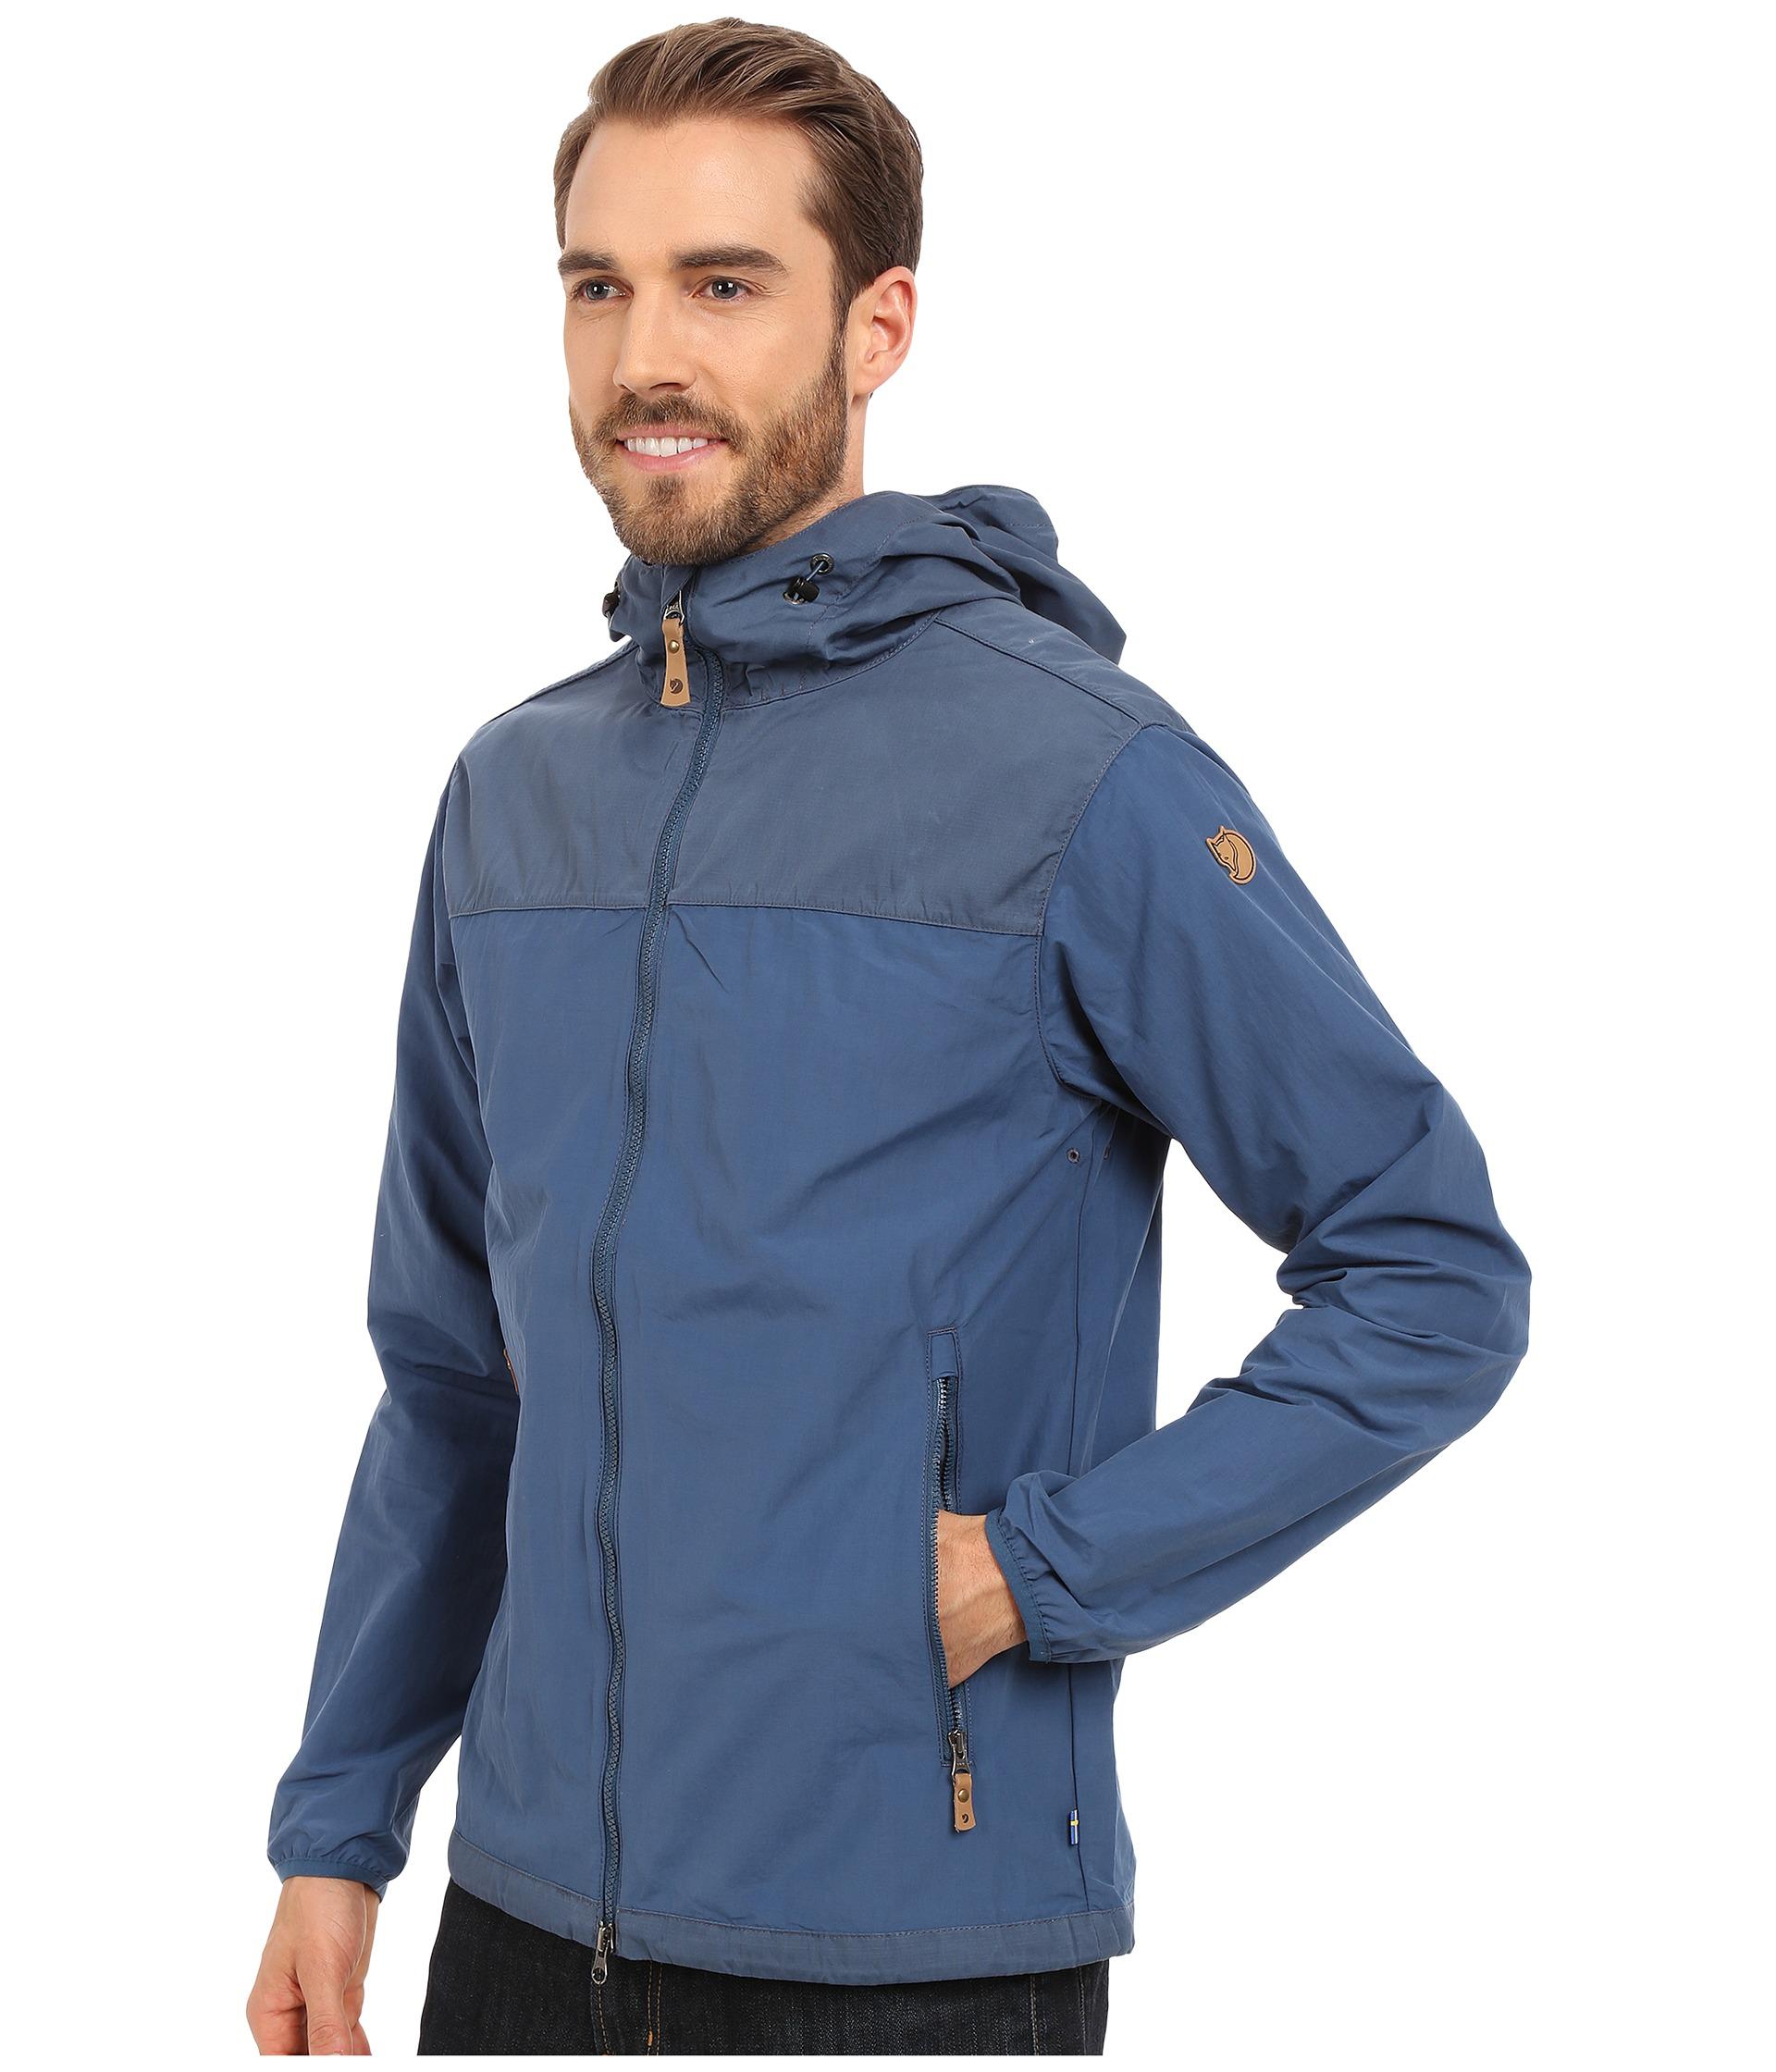 3908caa8 Fjallraven Abisko Hybrid Jacket in Blue for Men - Lyst